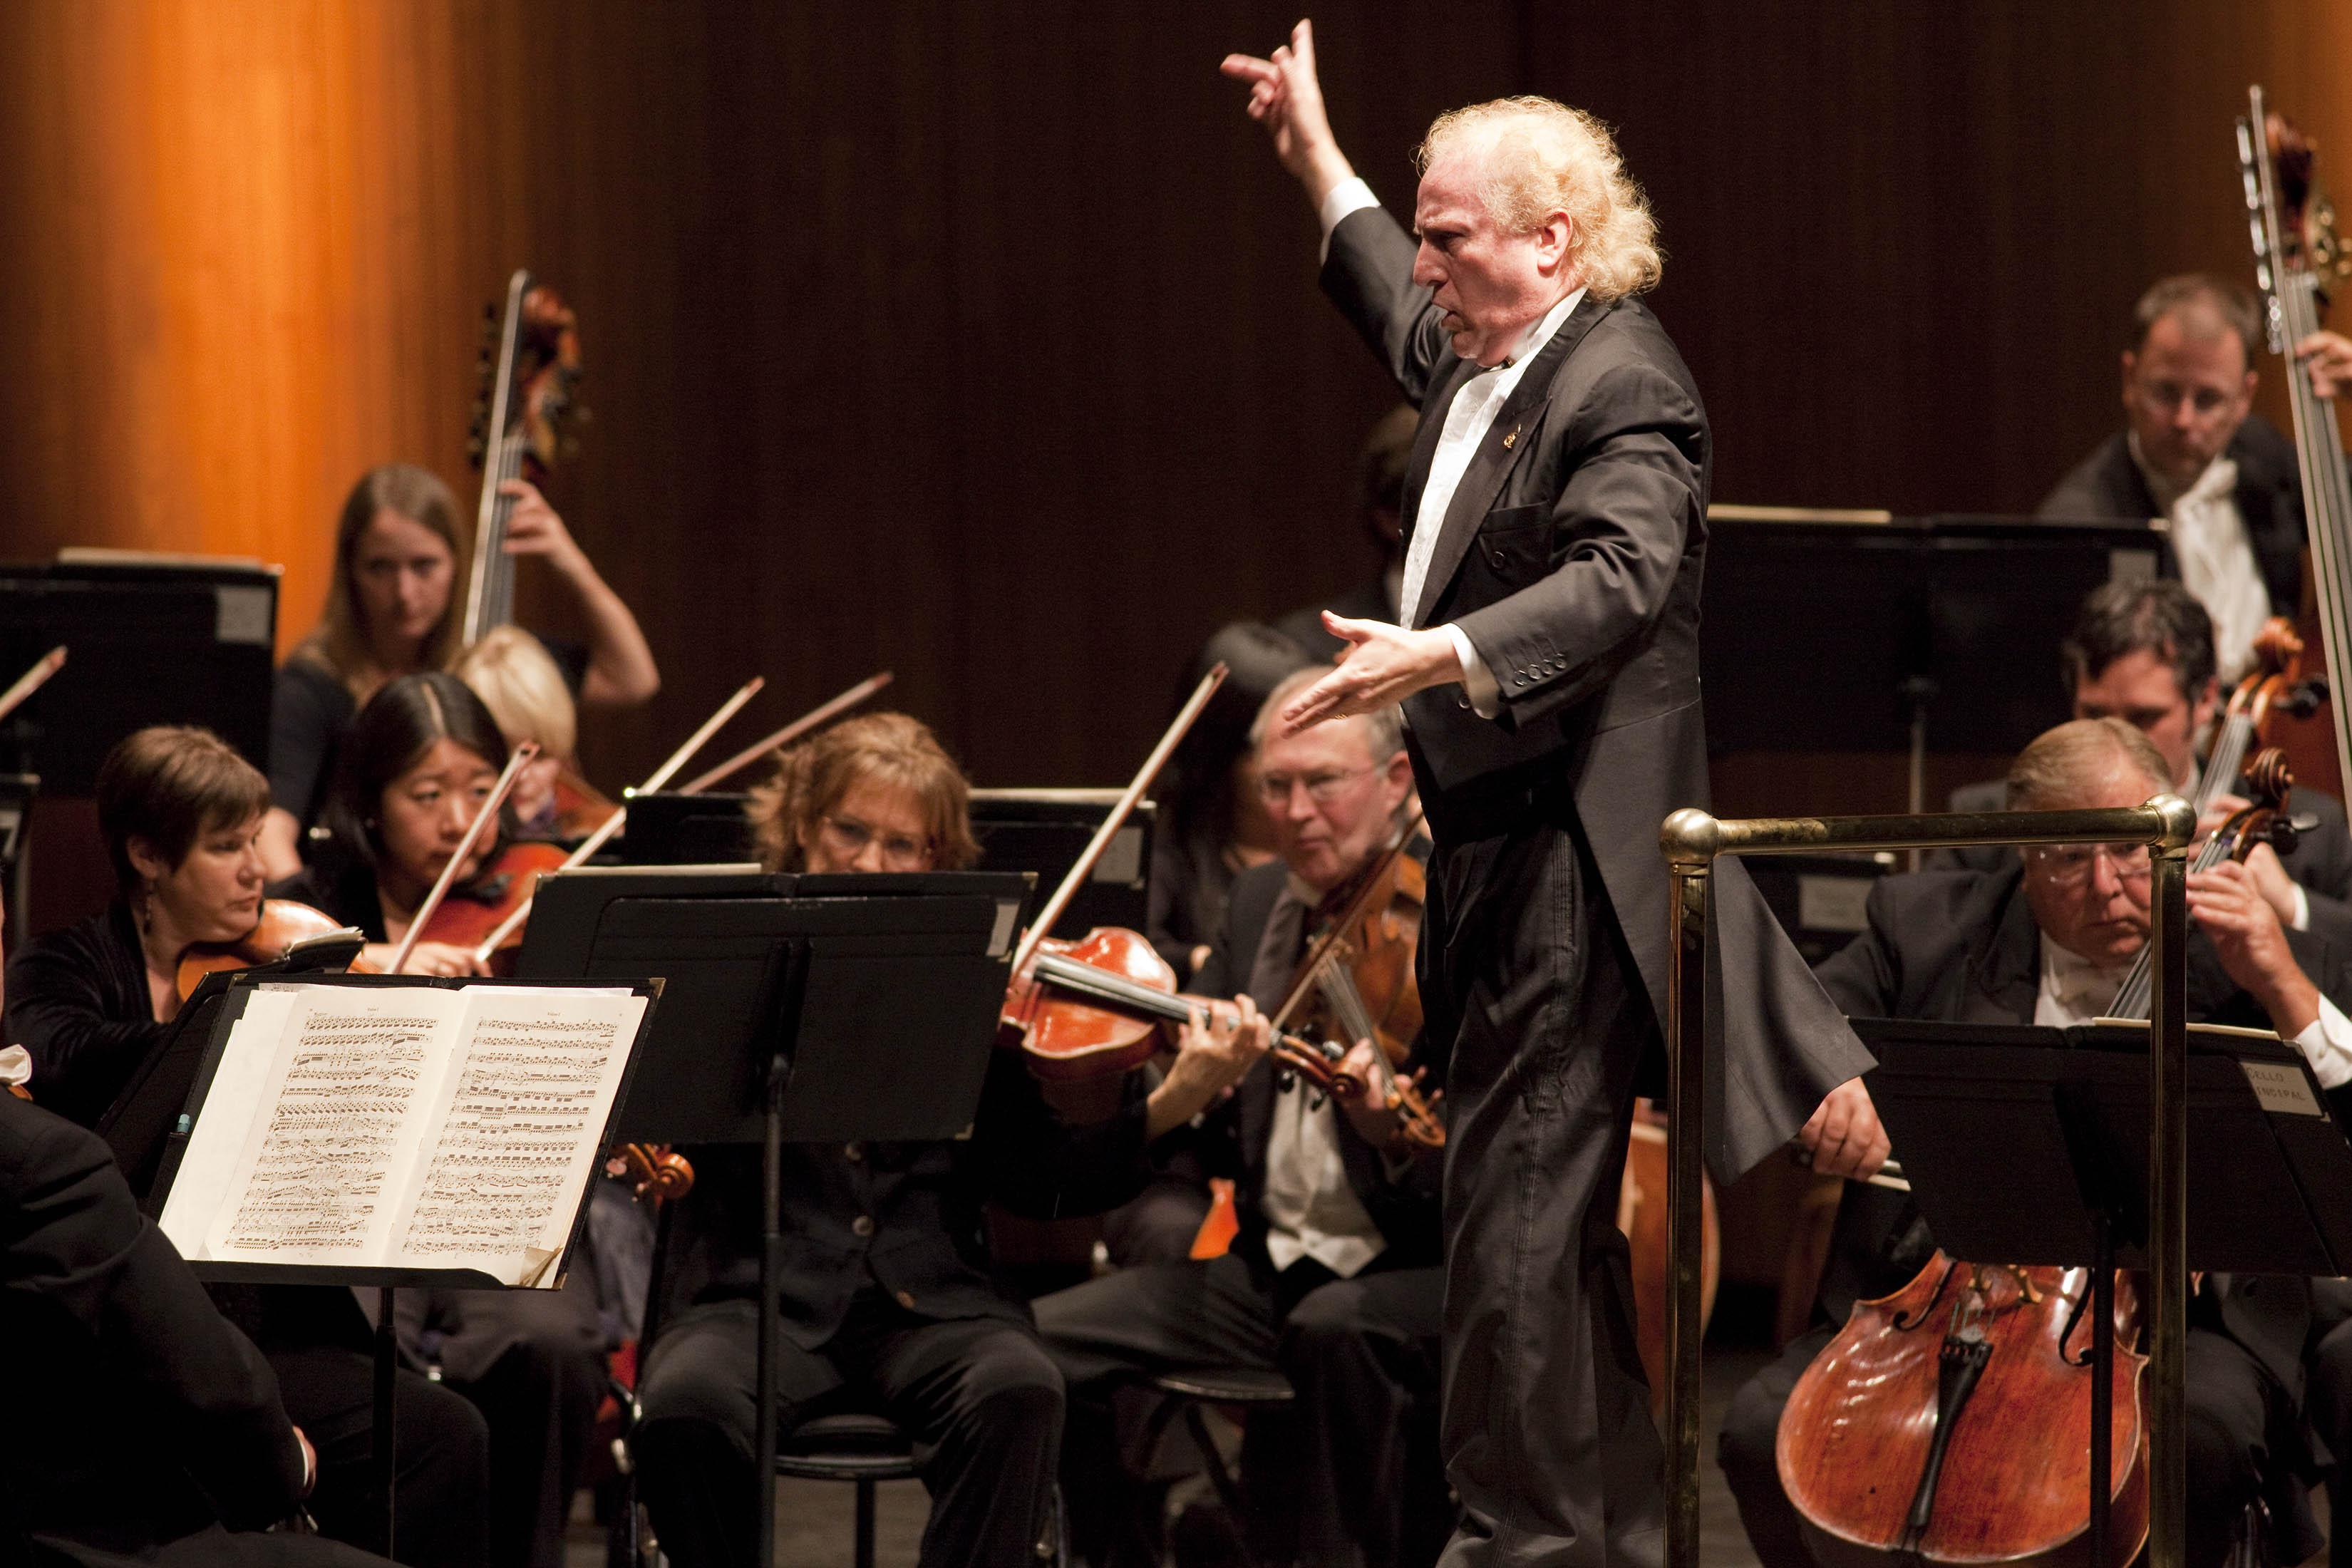 Maestro Diemecke and LBSO